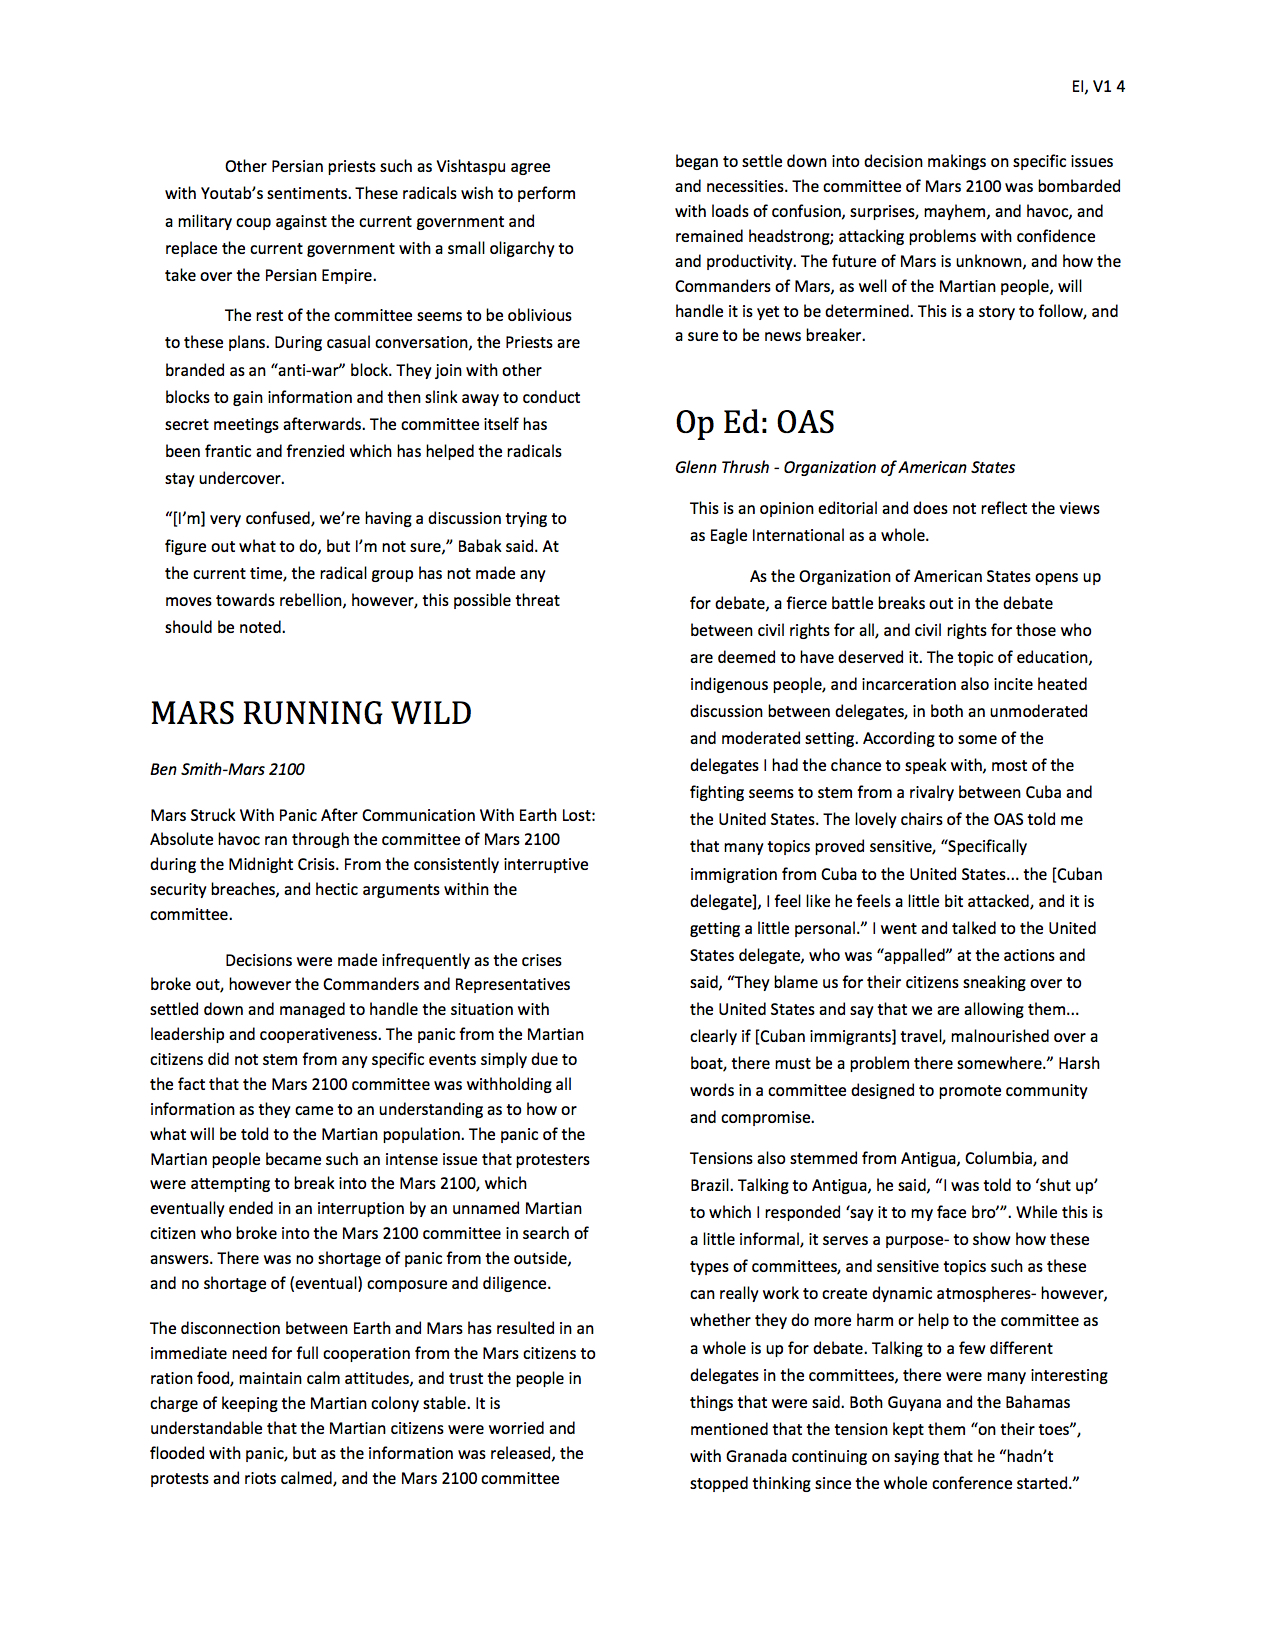 FINALEagle_International_News_(4).jpg